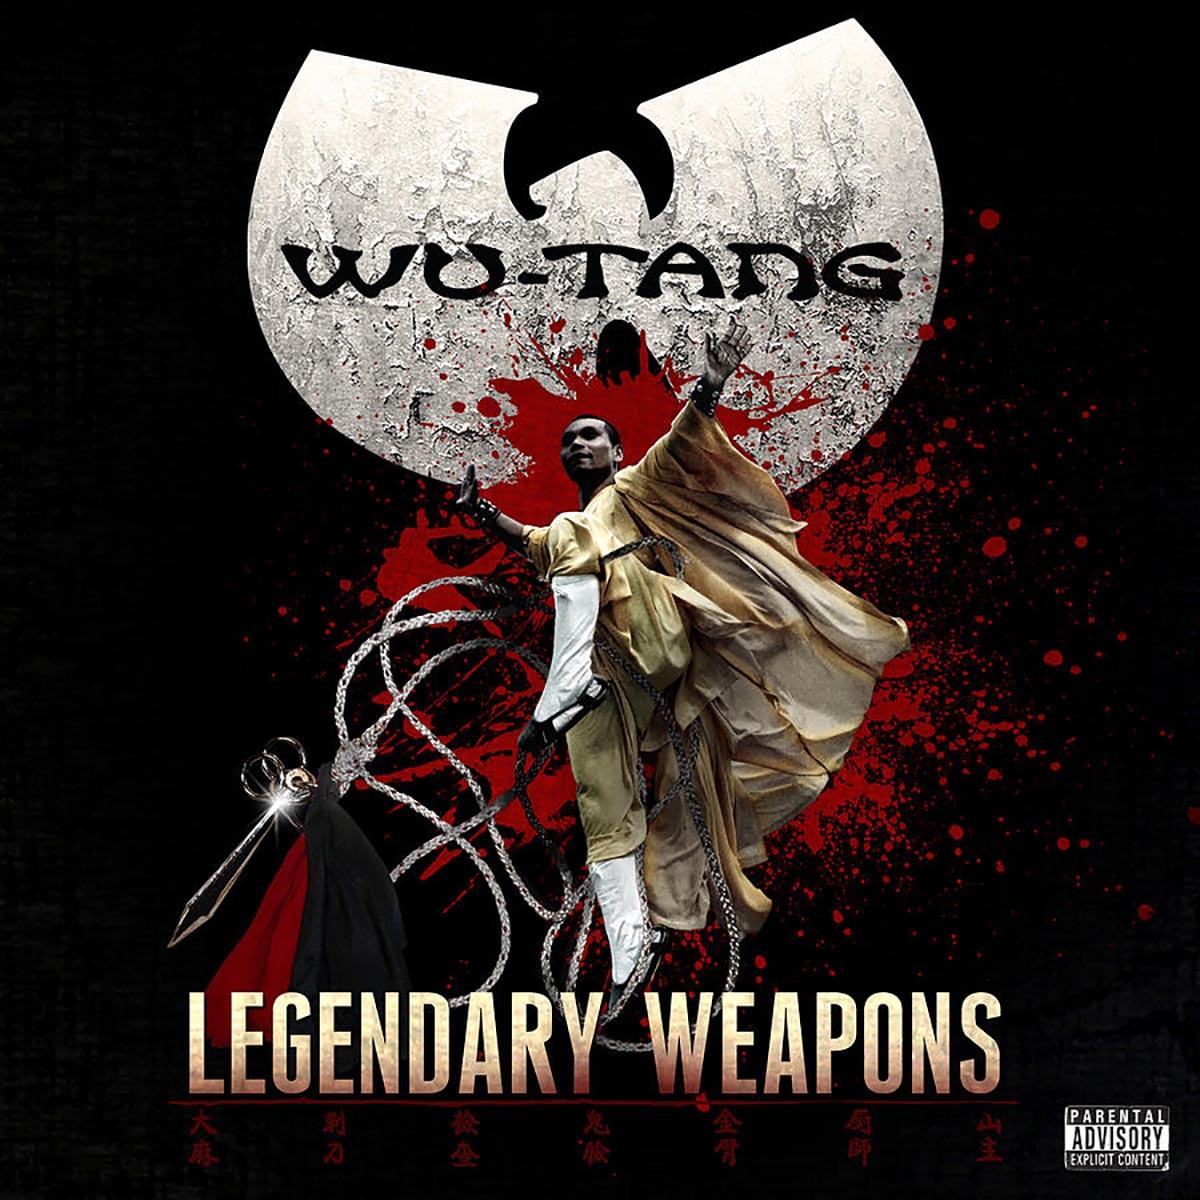 Wu-Tang Clan, Legendary Weapons